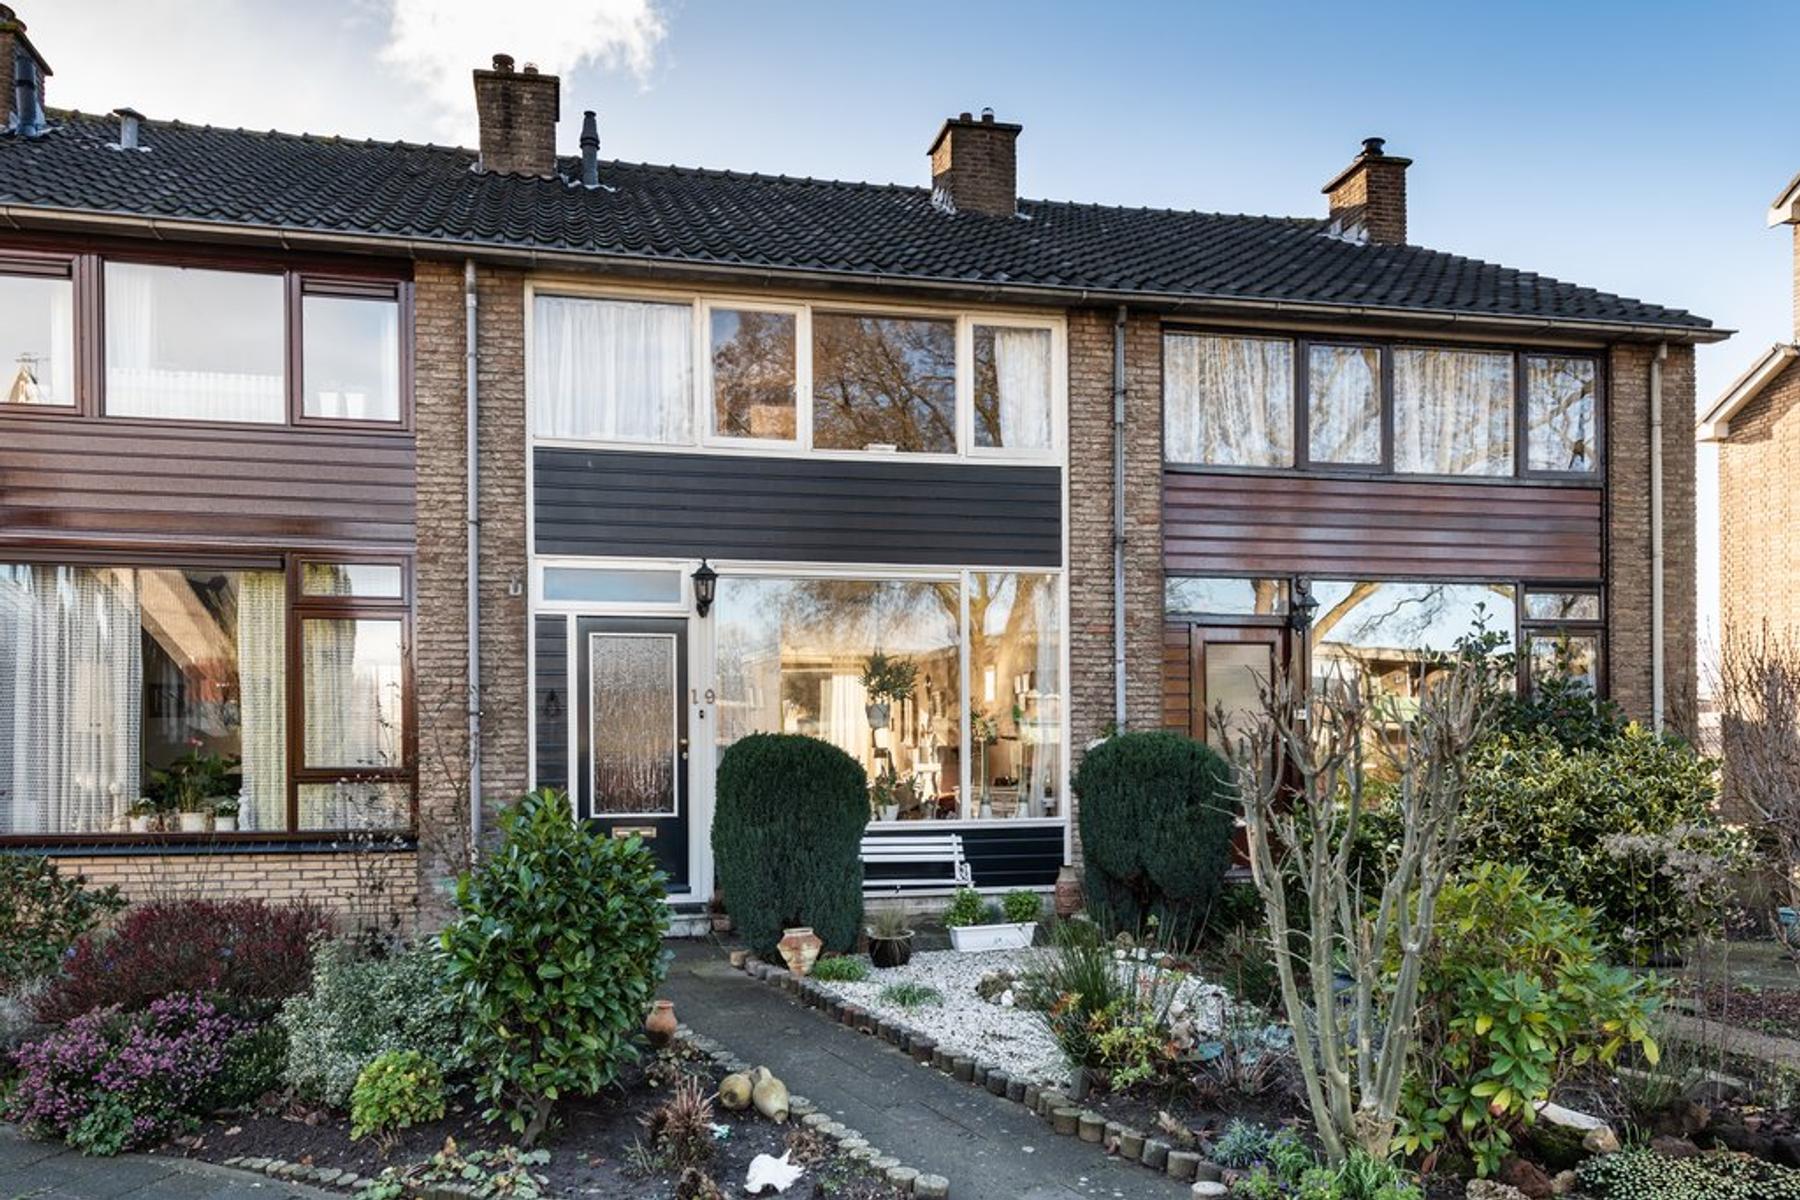 Beiersestraat 19 in Ridderkerk 2983 SB